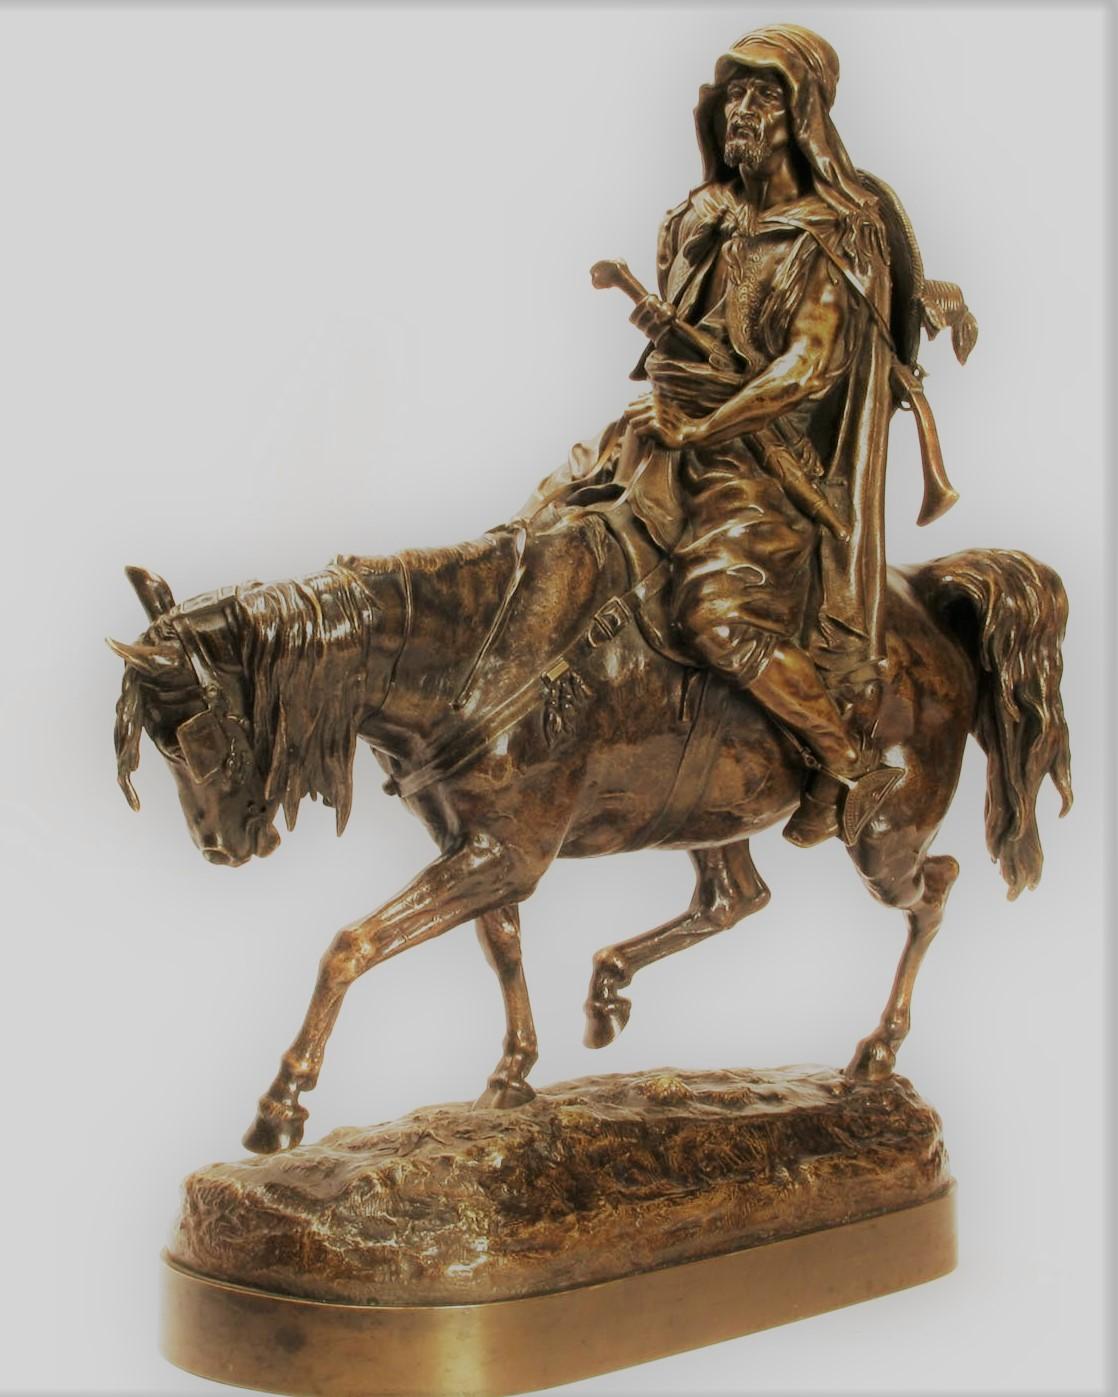 arab - sheih-arab-rider-bronze-russian-lanceray-lansere-shopen-berto-foundry